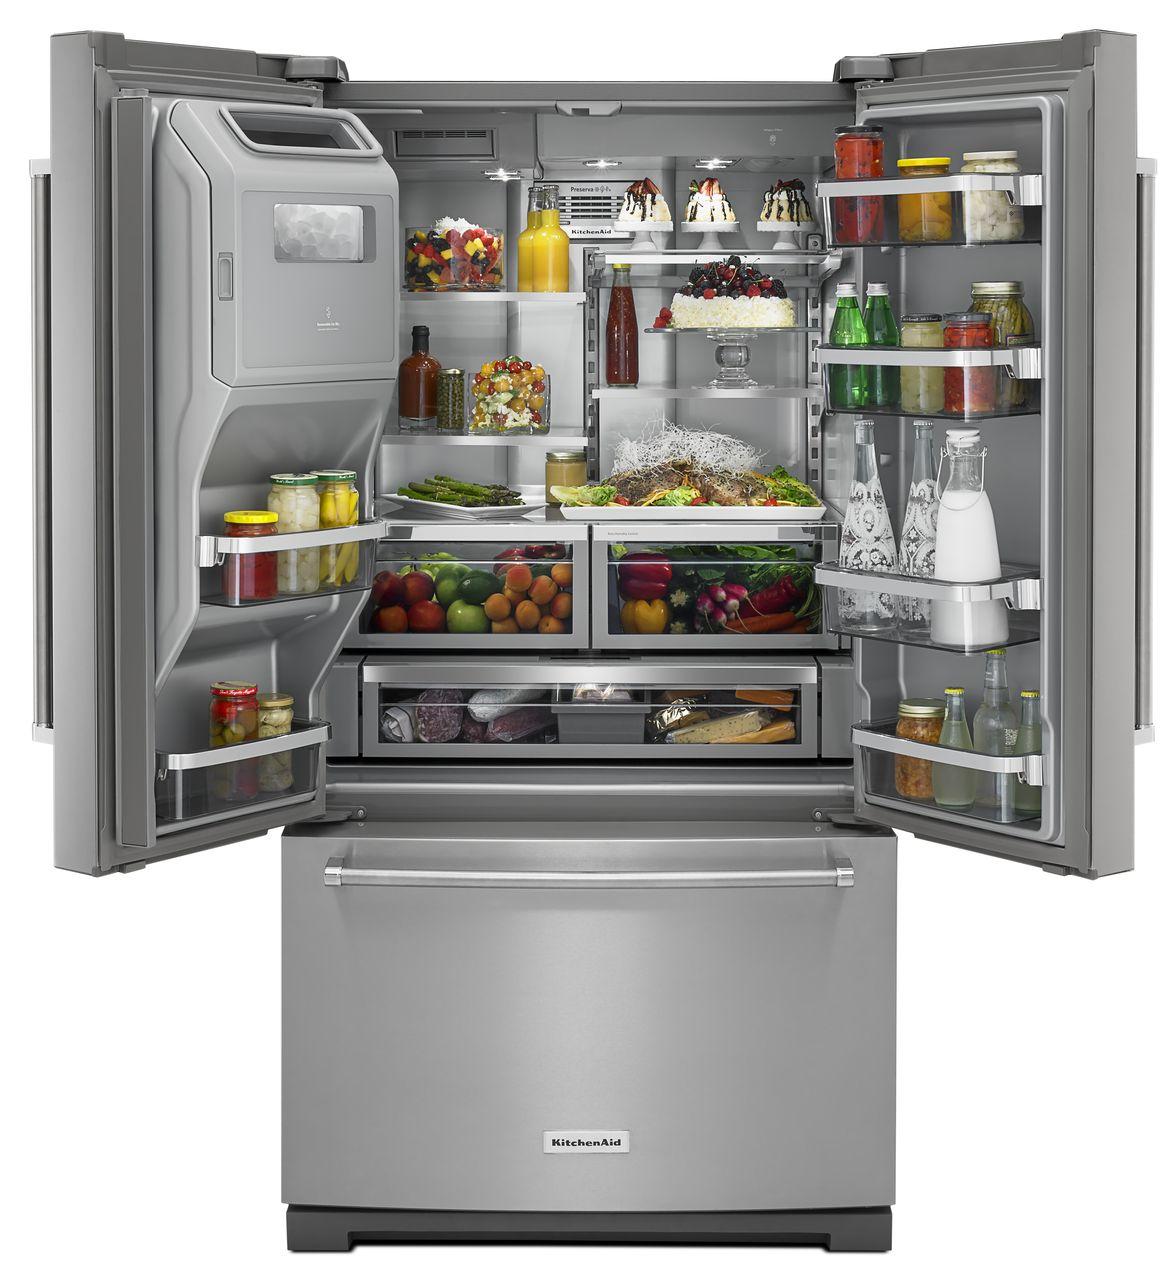 Kitchenaid 29 Cu Ft French Door Refrigerator Master